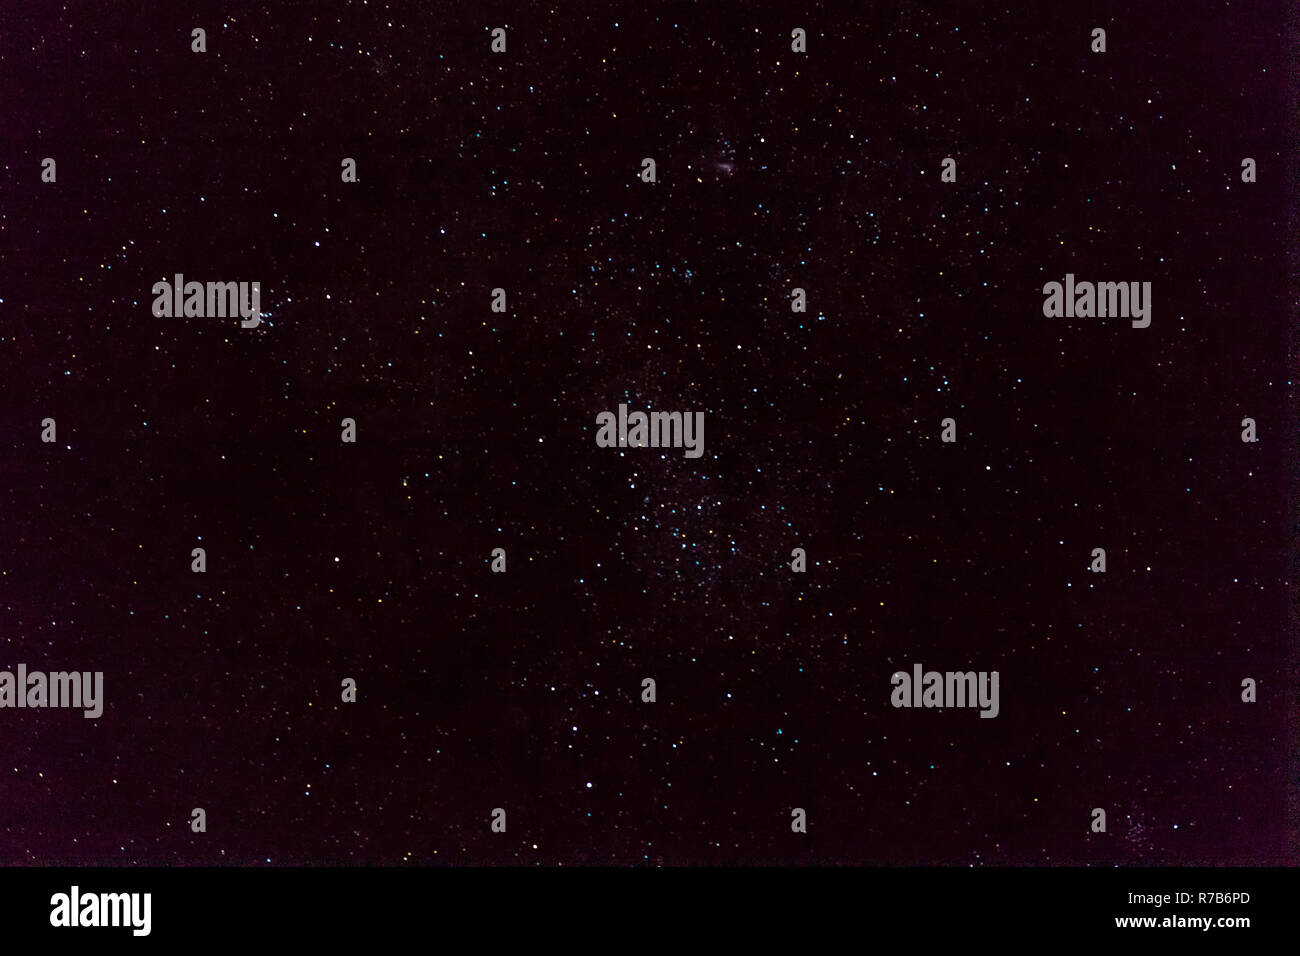 Sagittarius Star Cloud - Stock Image